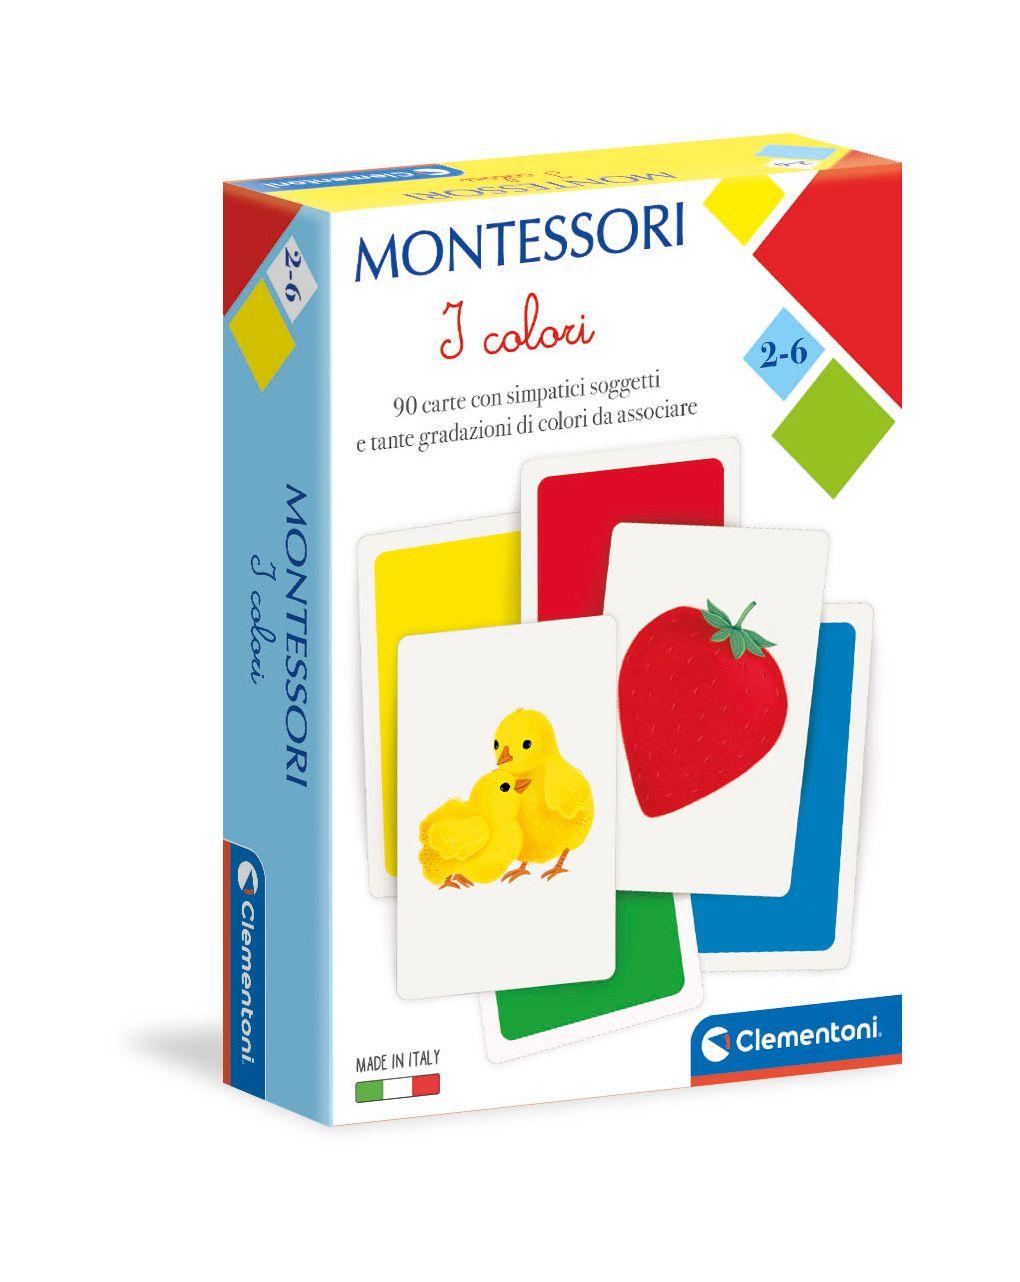 Clementoni - montessori - i colori - Clementoni